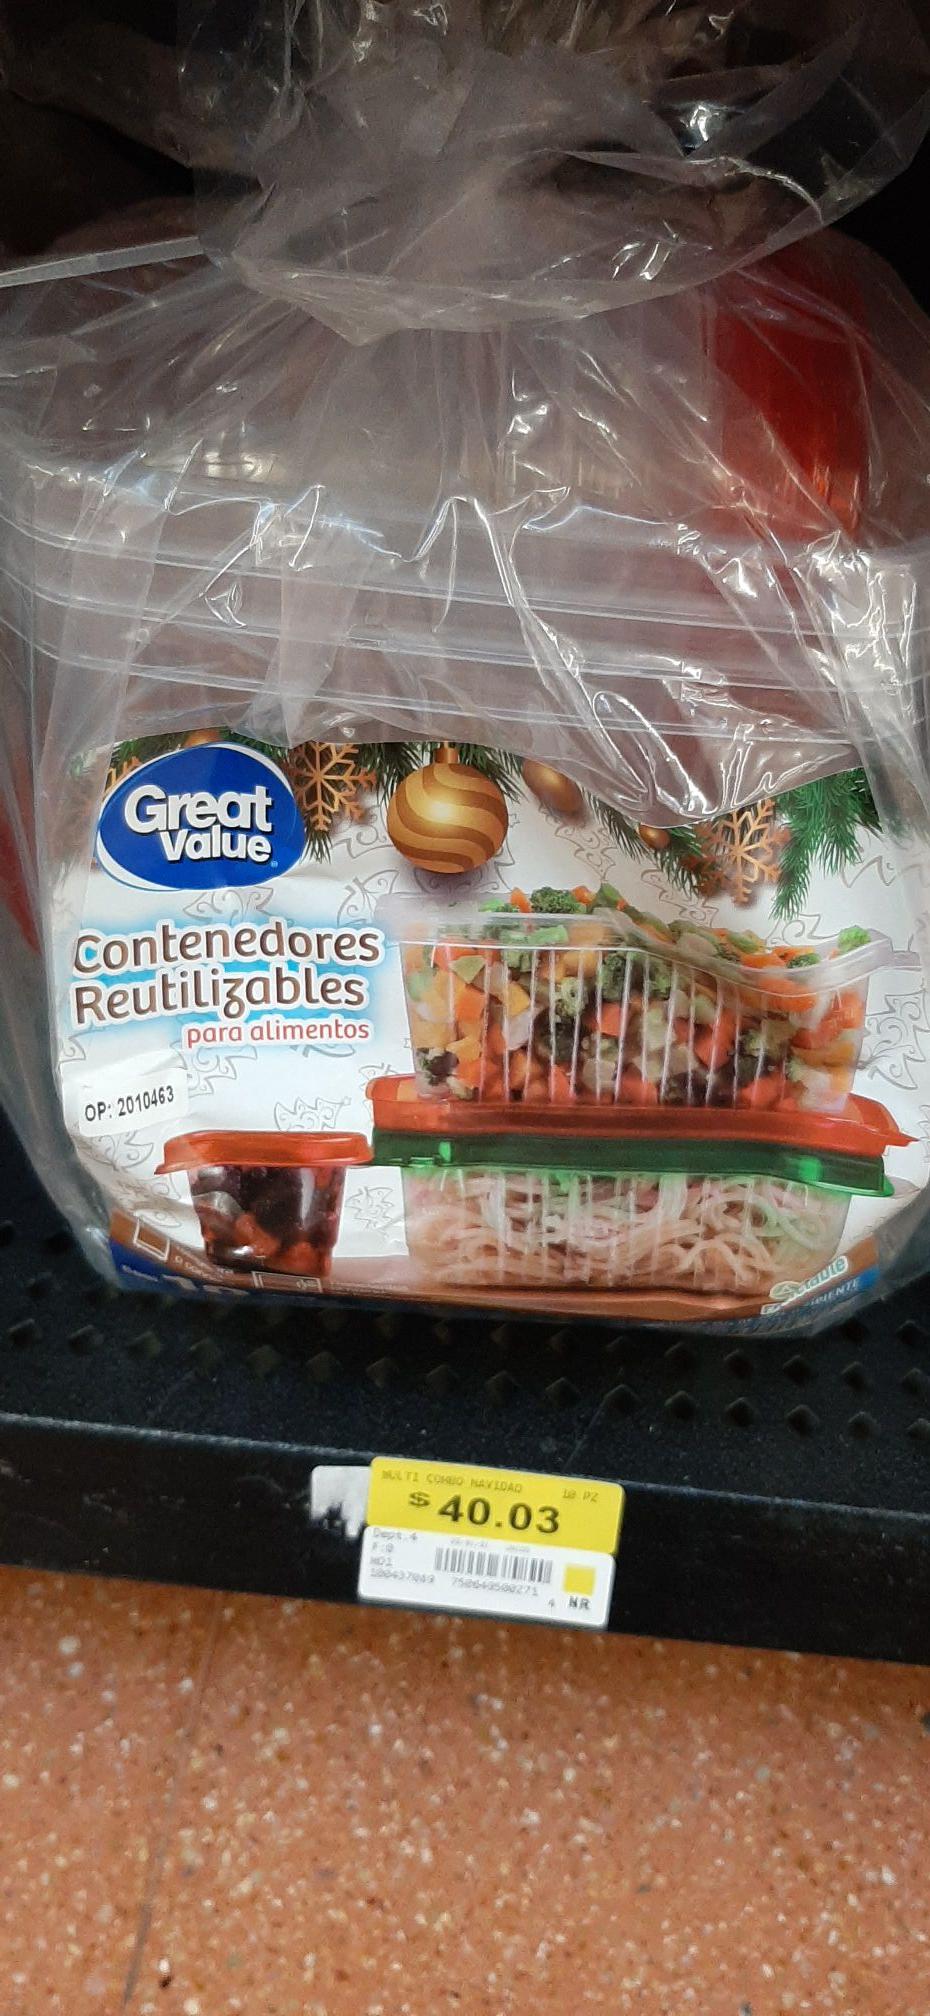 Walmart: 10 Contenedores reutilizables Great Value